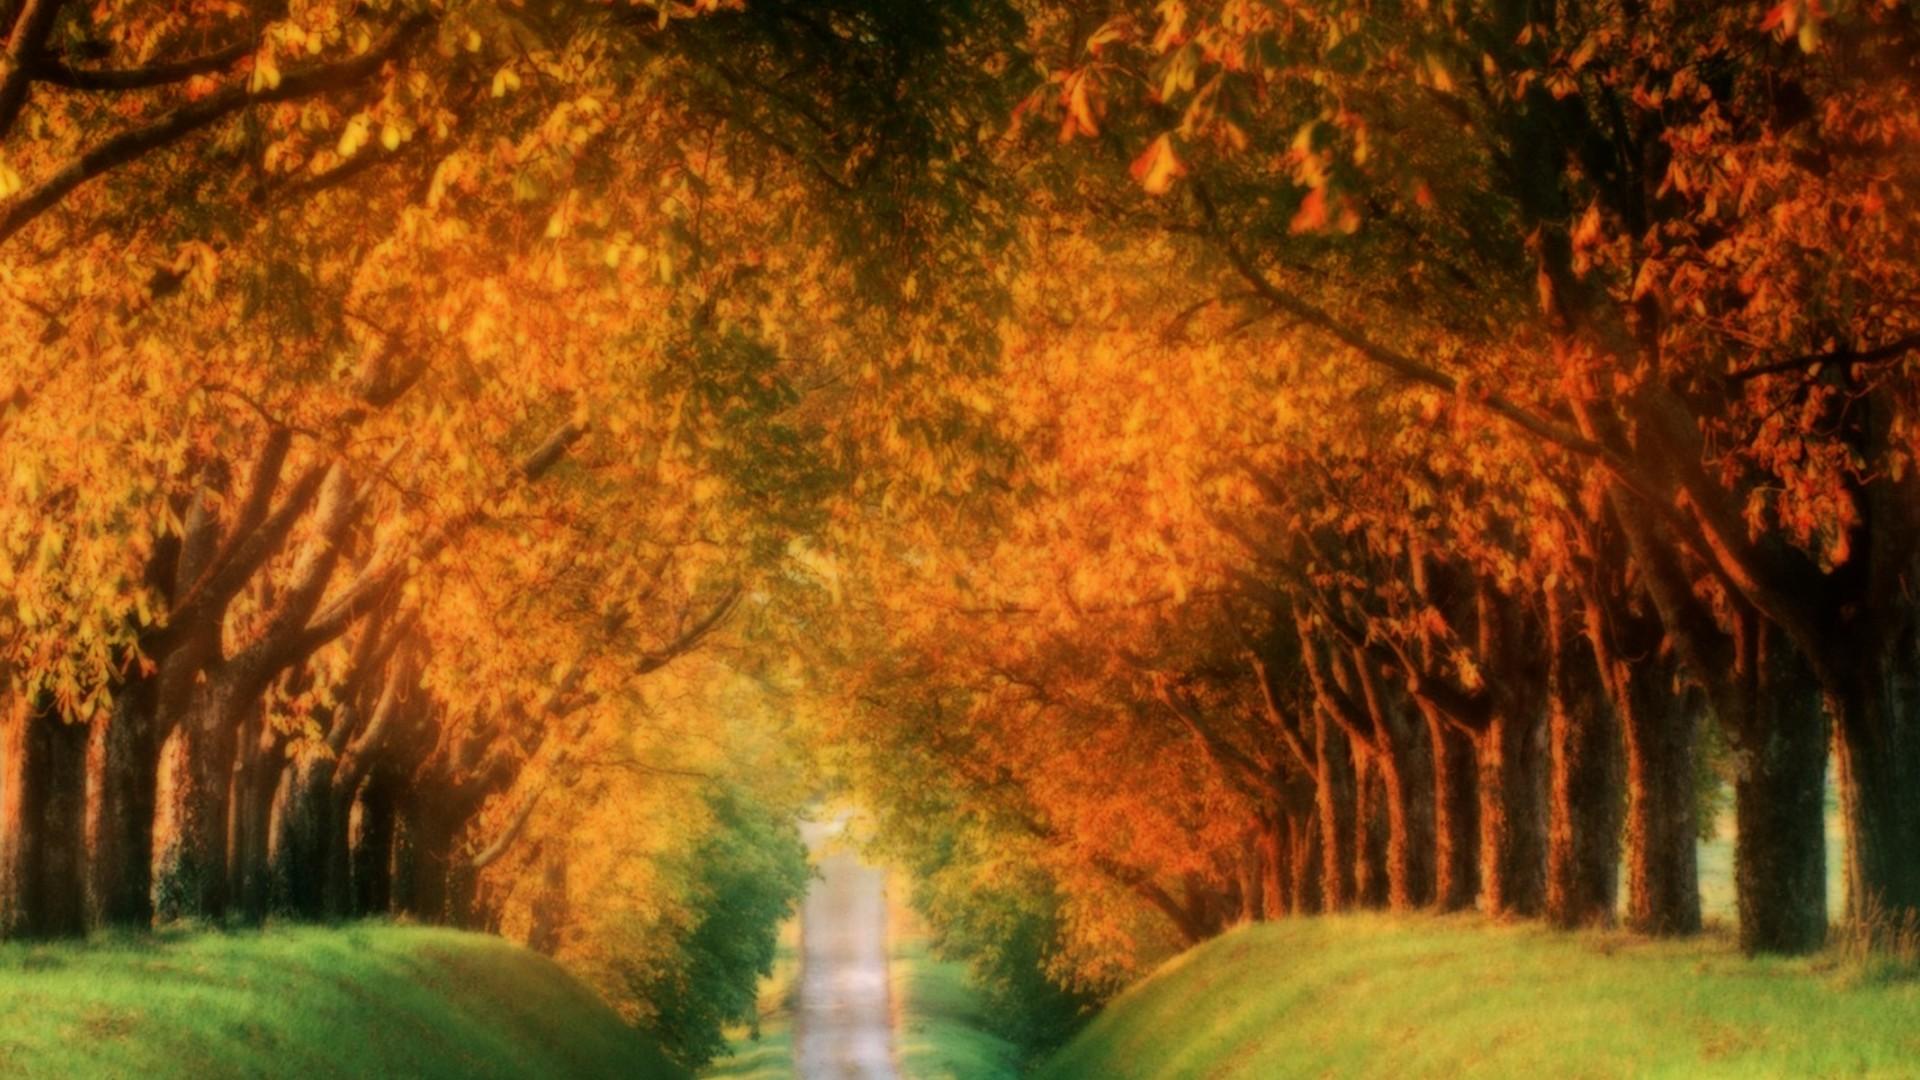 Pretty Fall Backgrounds For Desktops Fall wallpapers for desktop